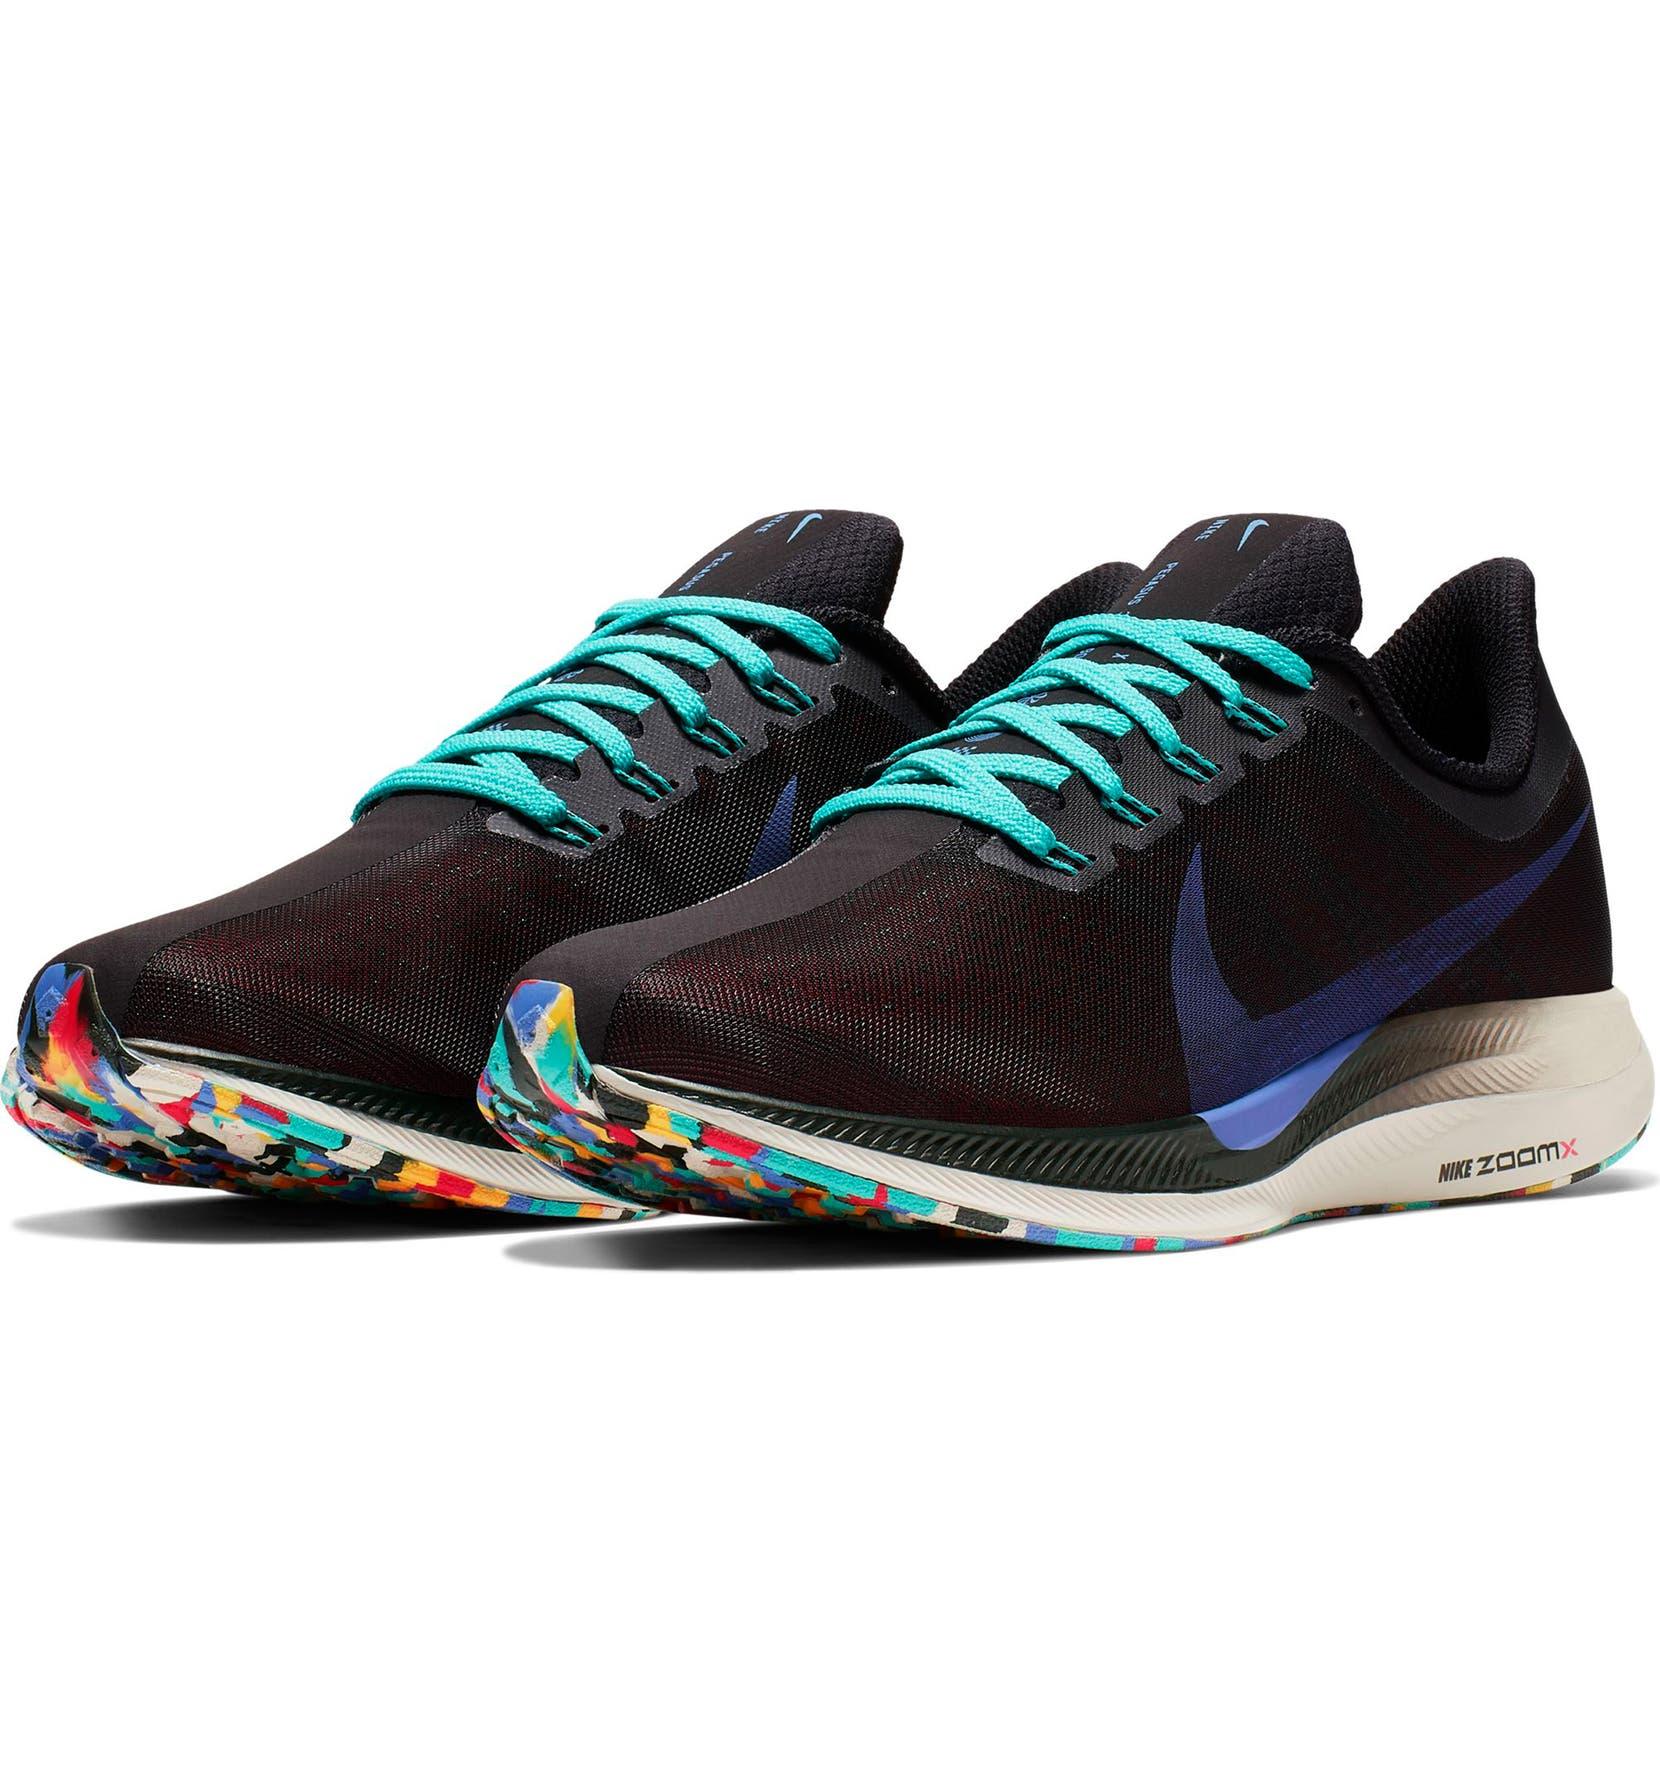 08b6688b61206 Zoom Pegasus 35 Turbo Running Shoe